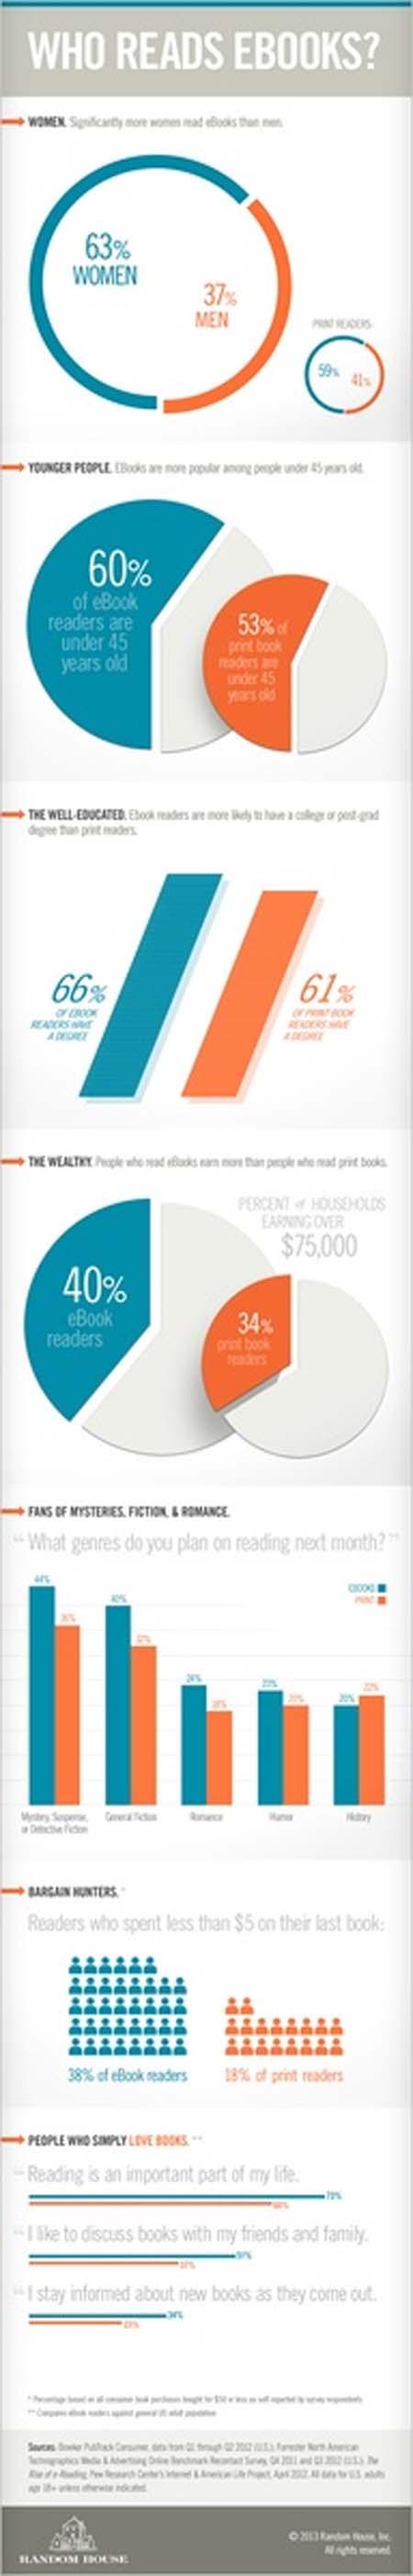 Ebook Readers Infographic